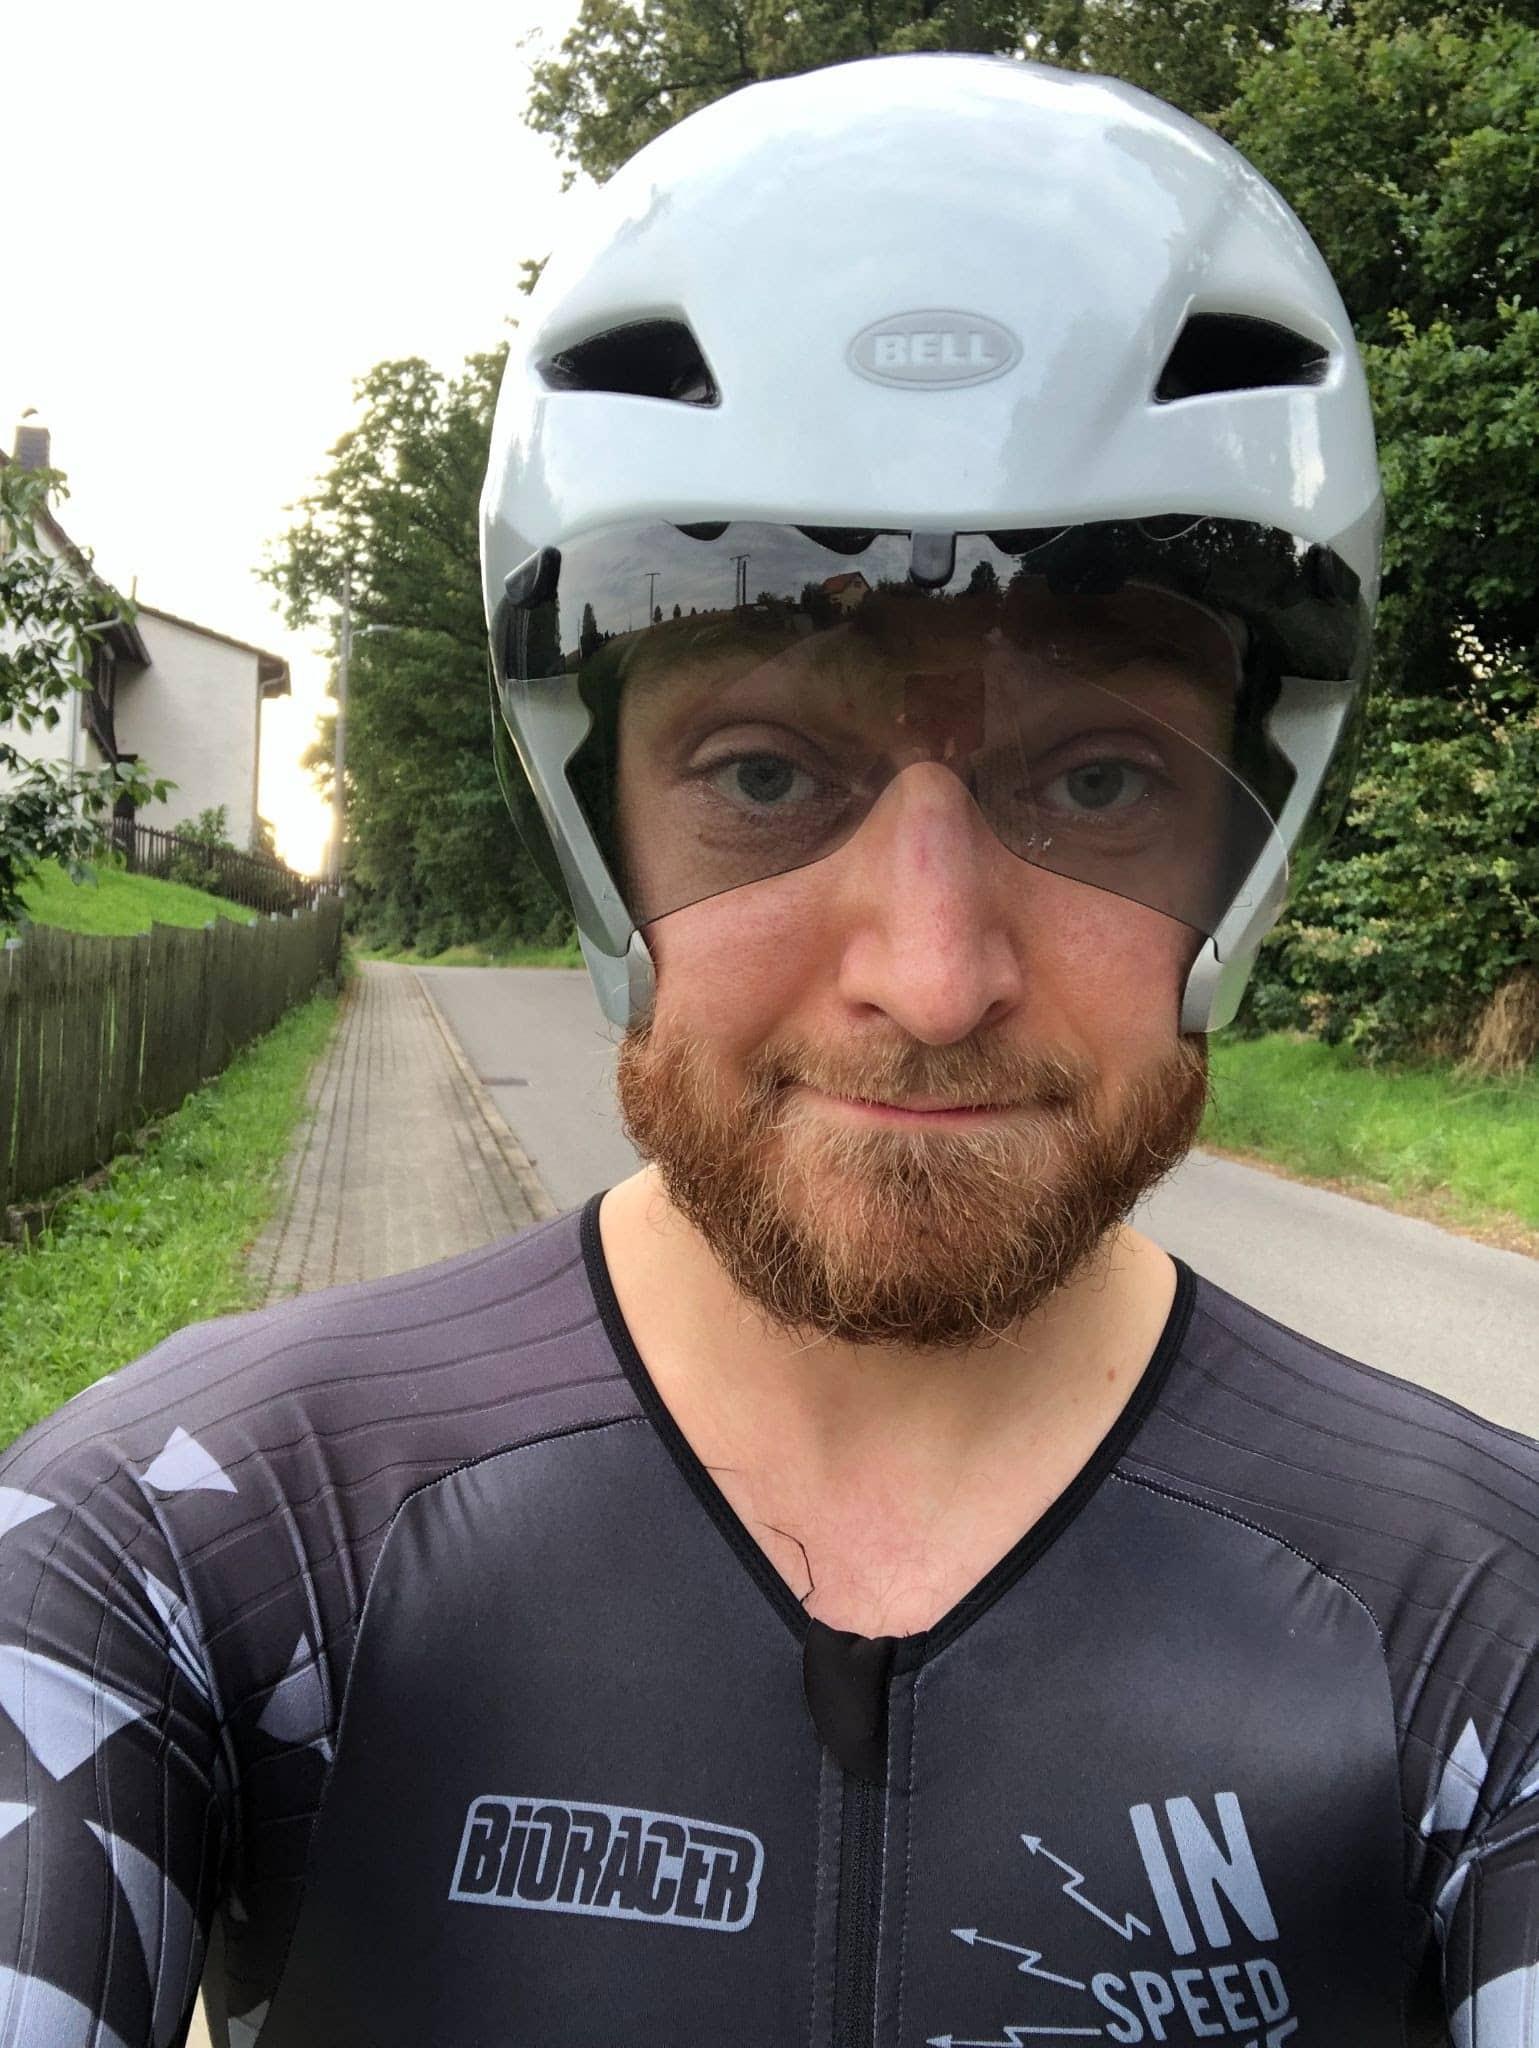 Cyclist with helmet